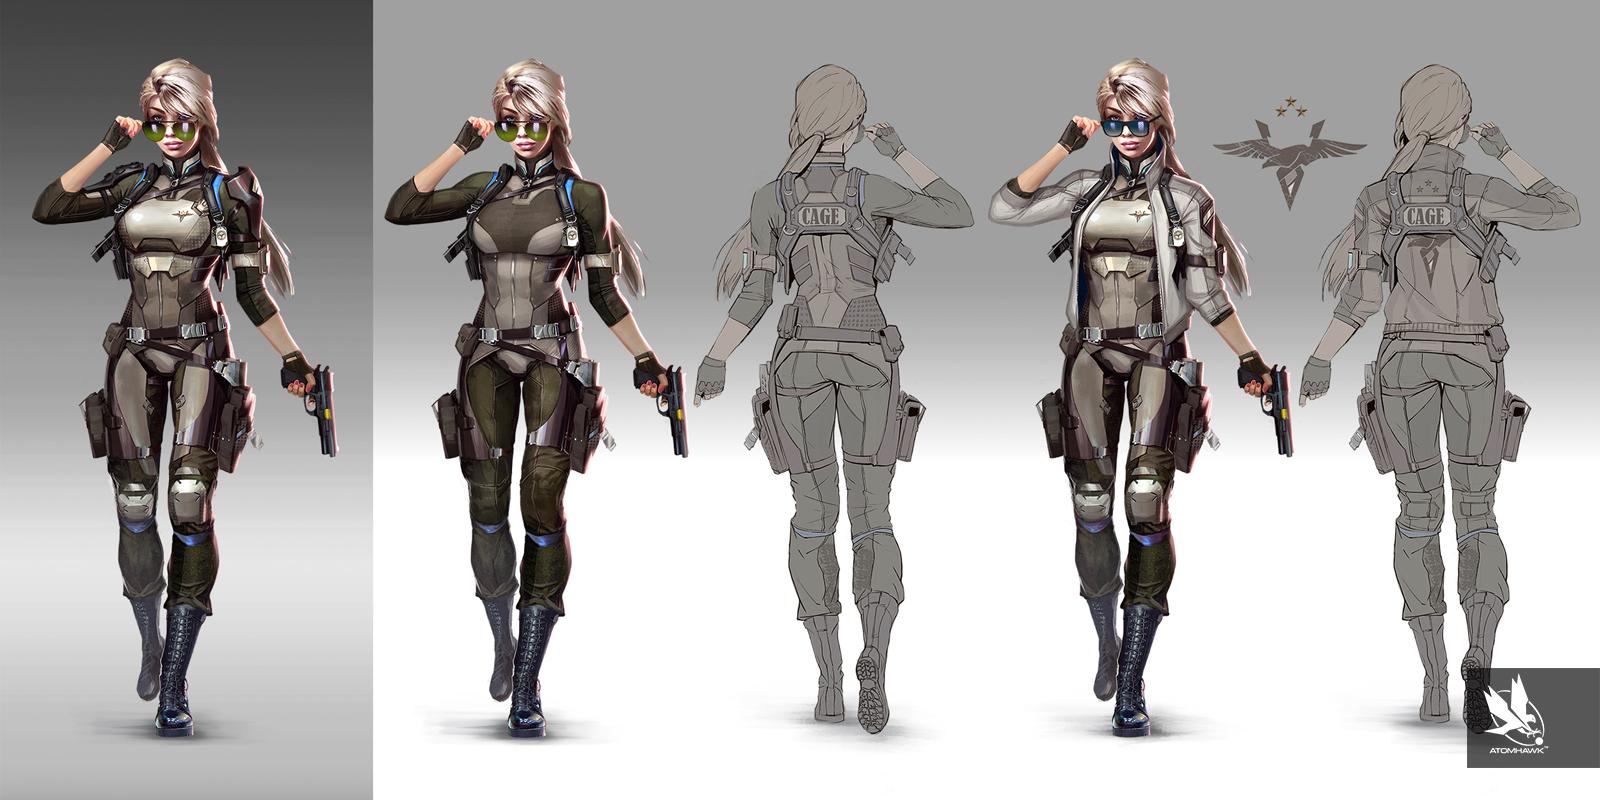 Atomhawk_Warner-Bros-NetherRealm_Mortal-Kombat-11_Concept-Art_Character-Design_Cassie-Cage_Present_1.jpg